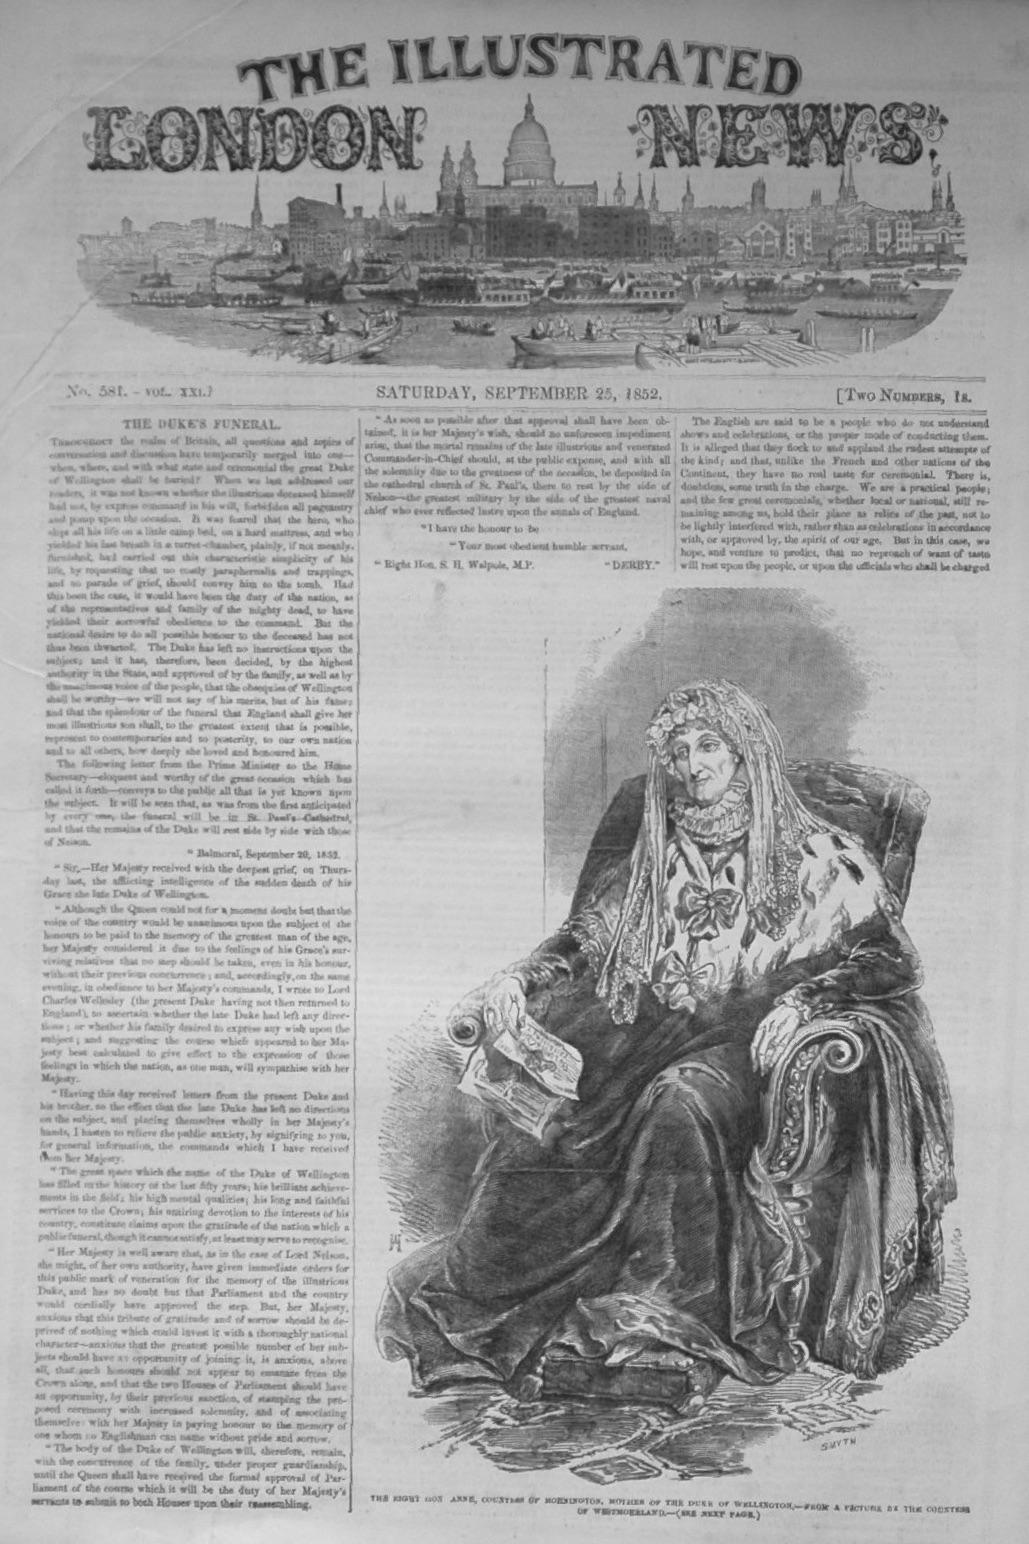 Illustrated London News, September 25th, 1852.